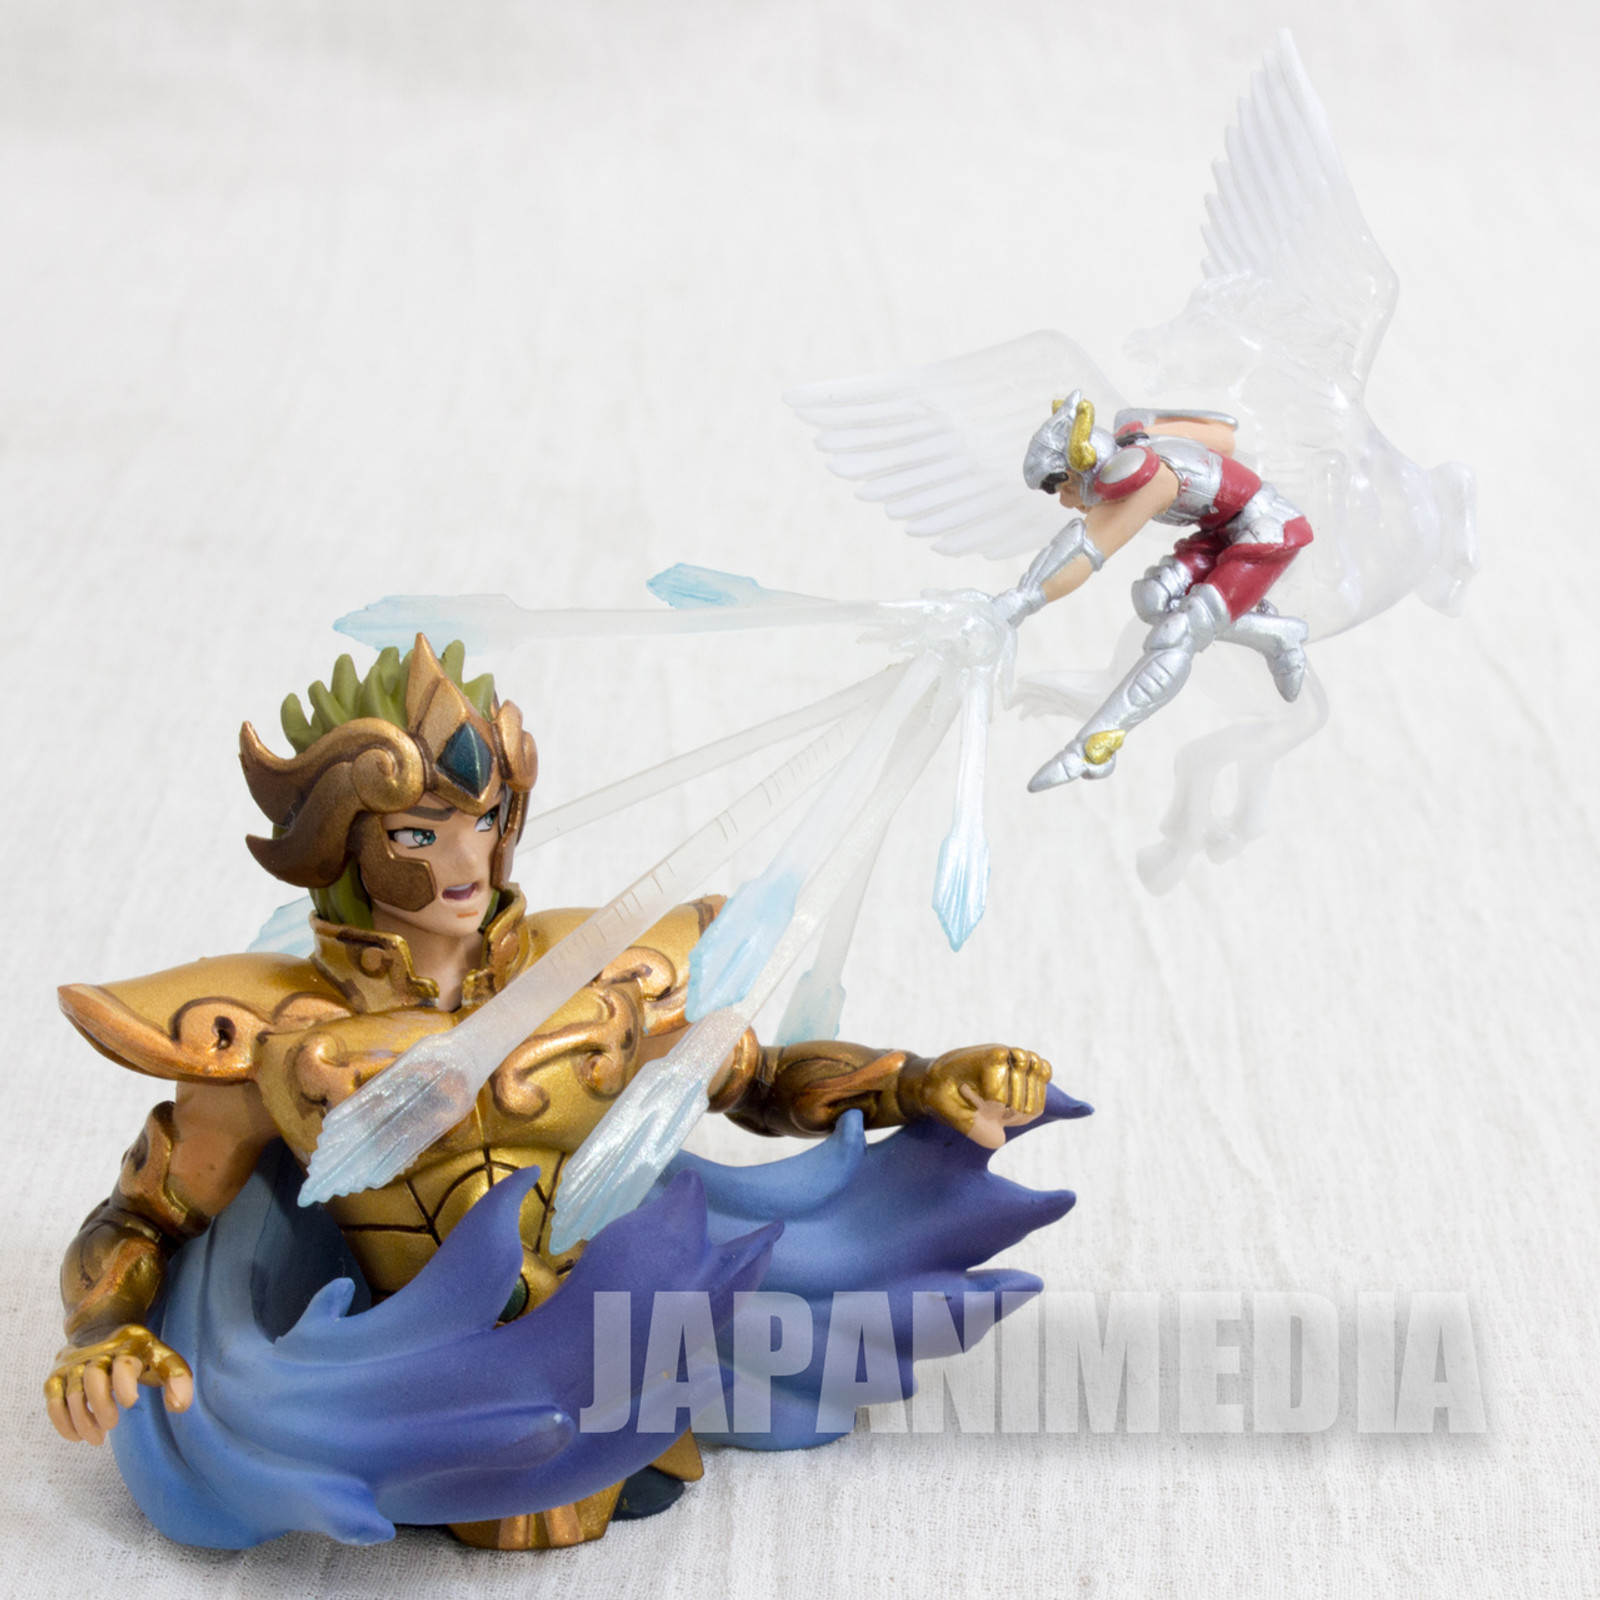 Saint Seiya Diorama Figure Leo Aiolia VS Pegasus Seiya Megahouse JAPAN